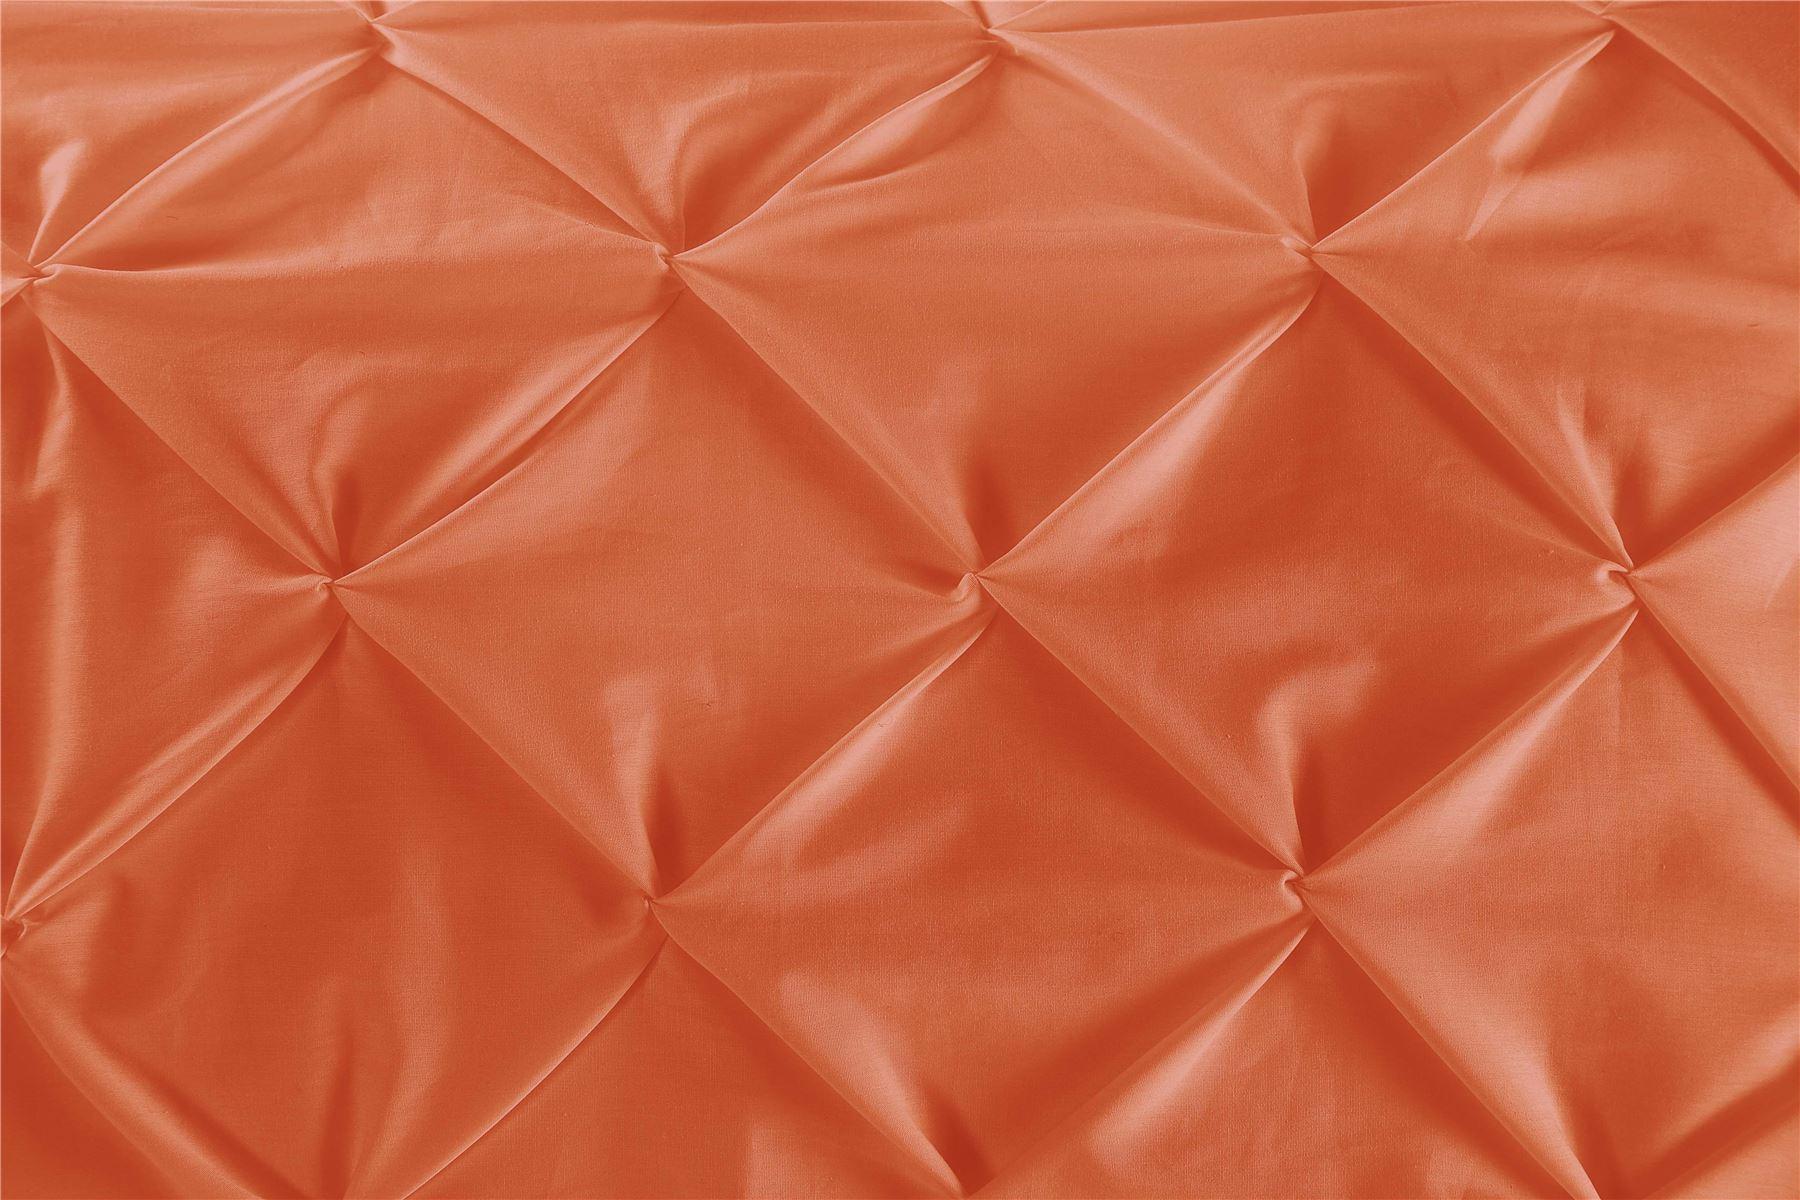 Luxury-Pure-100-Cotton-200-Thread-Pinch-Pleat-Pintuck-Puckering-Duvet-Cover-Set thumbnail 26